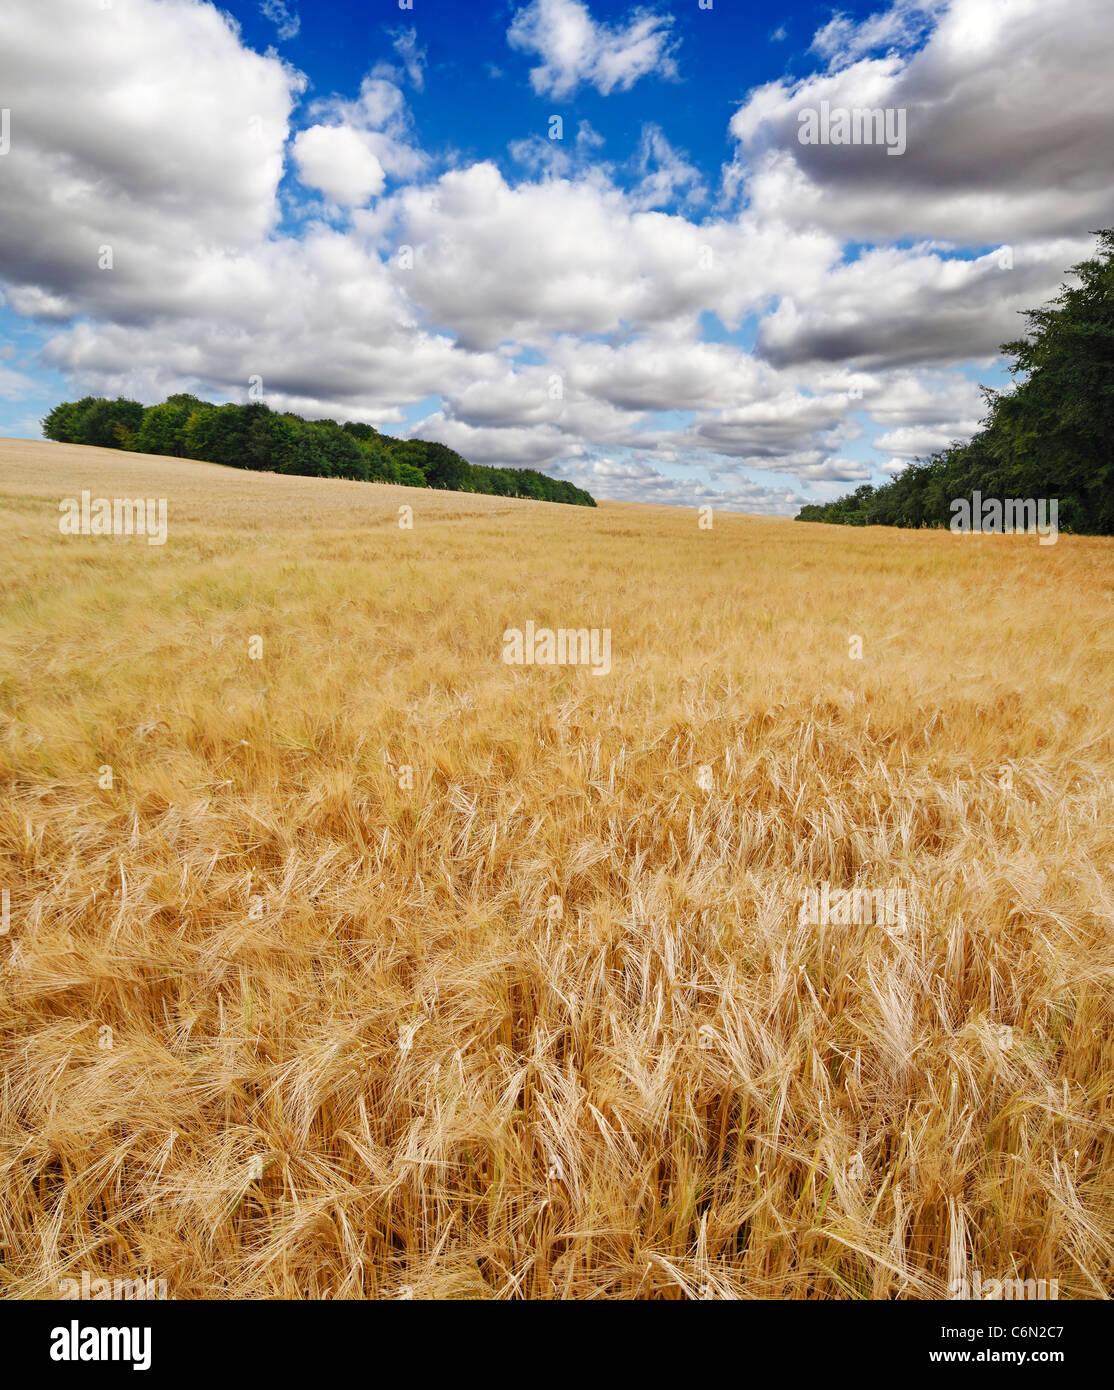 Barley Field, Knighton, Oxfordshire, United Kingdom. - Stock Image